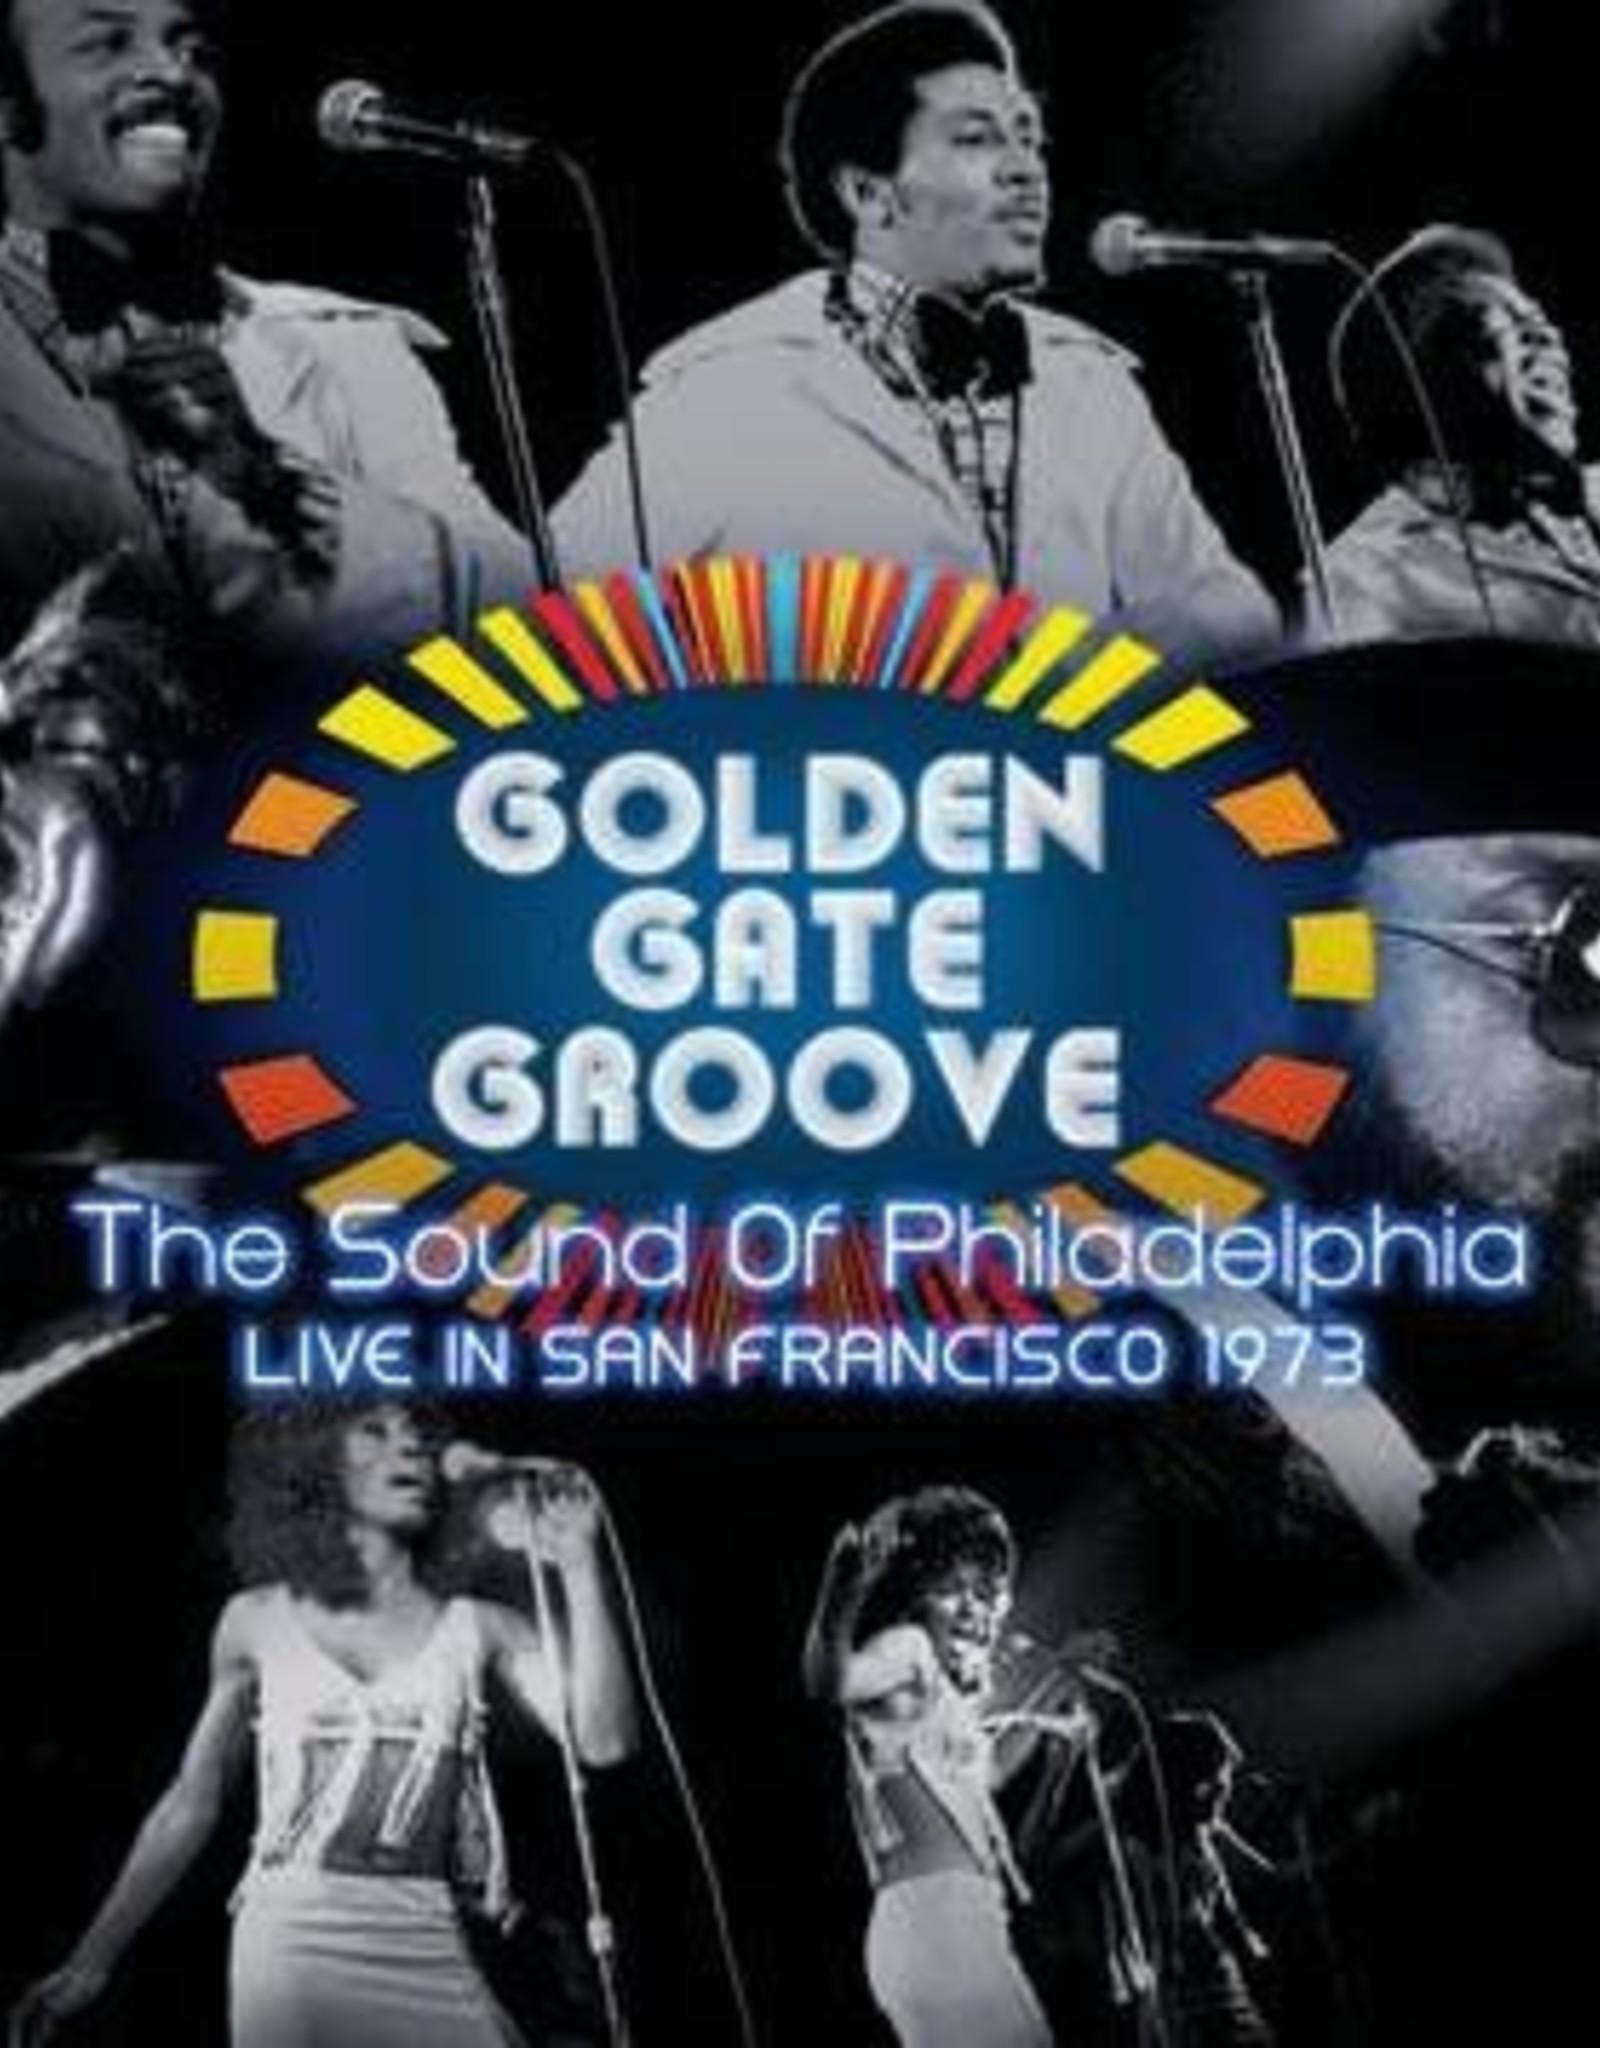 Golden Gate Groove: The Sound Of Philadelphia Live In San Francisco 1973 (2Lp) (6/21)